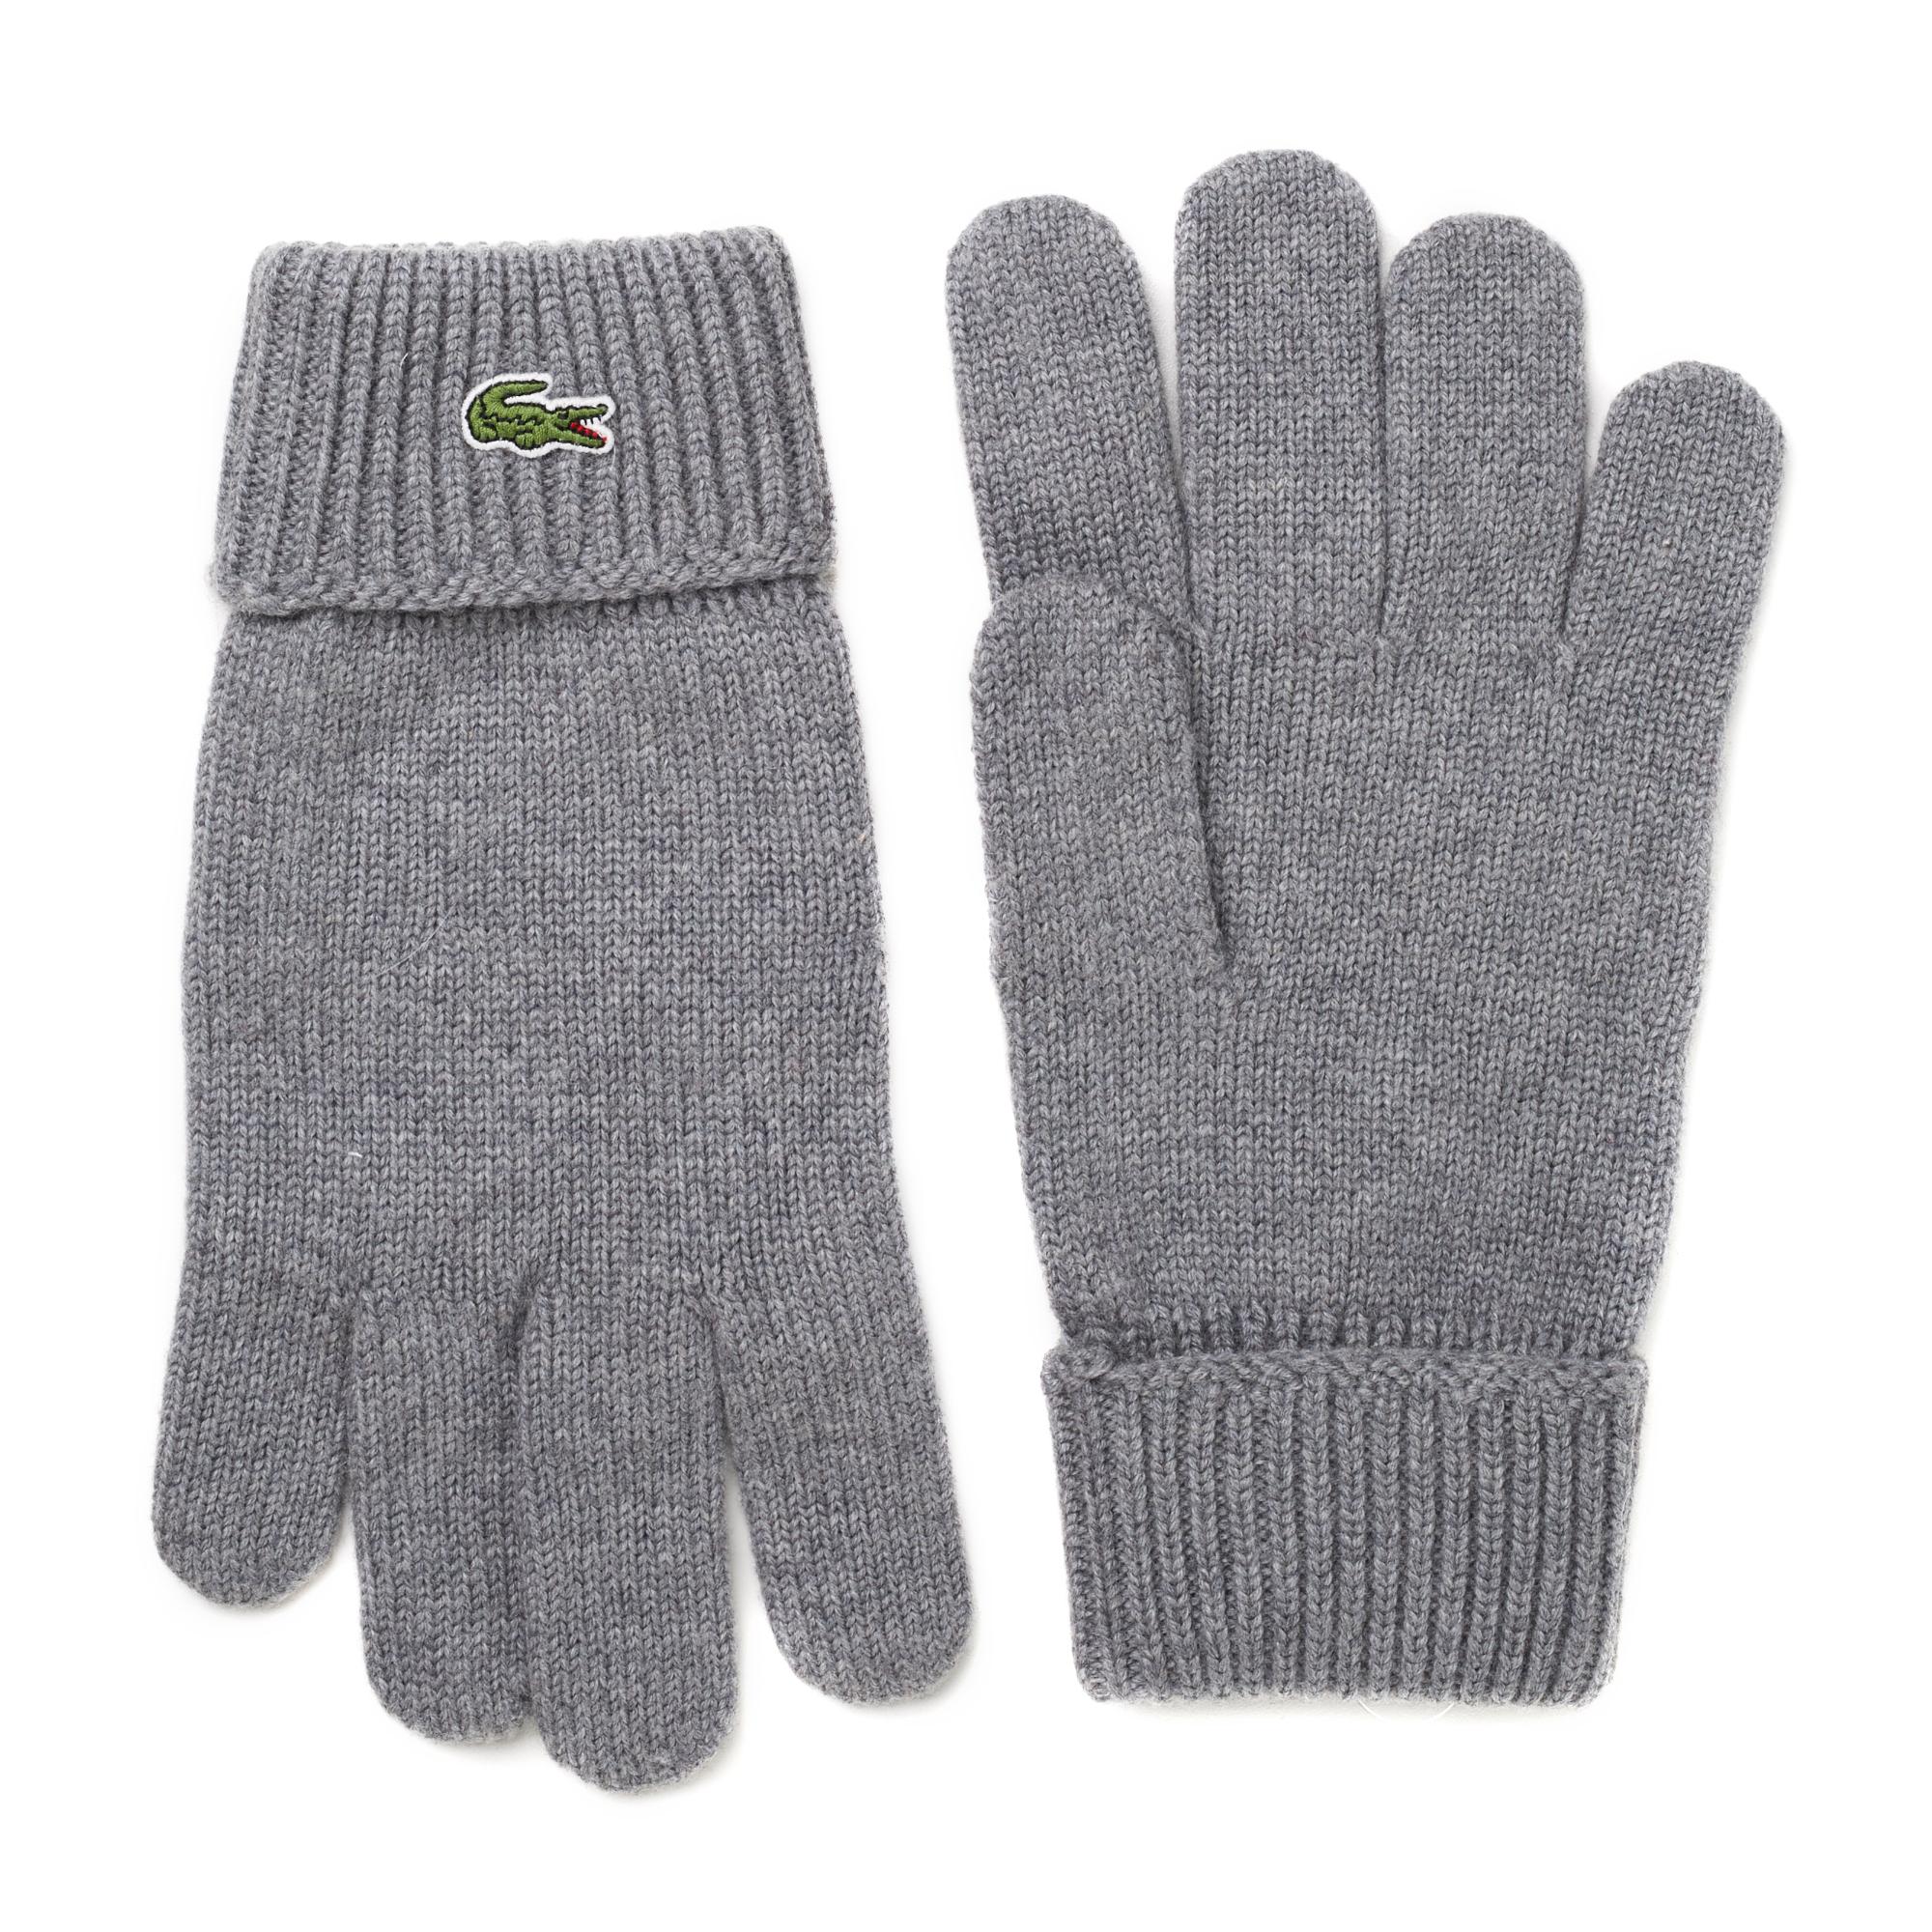 Фото - Перчатки Lacoste серого цвета